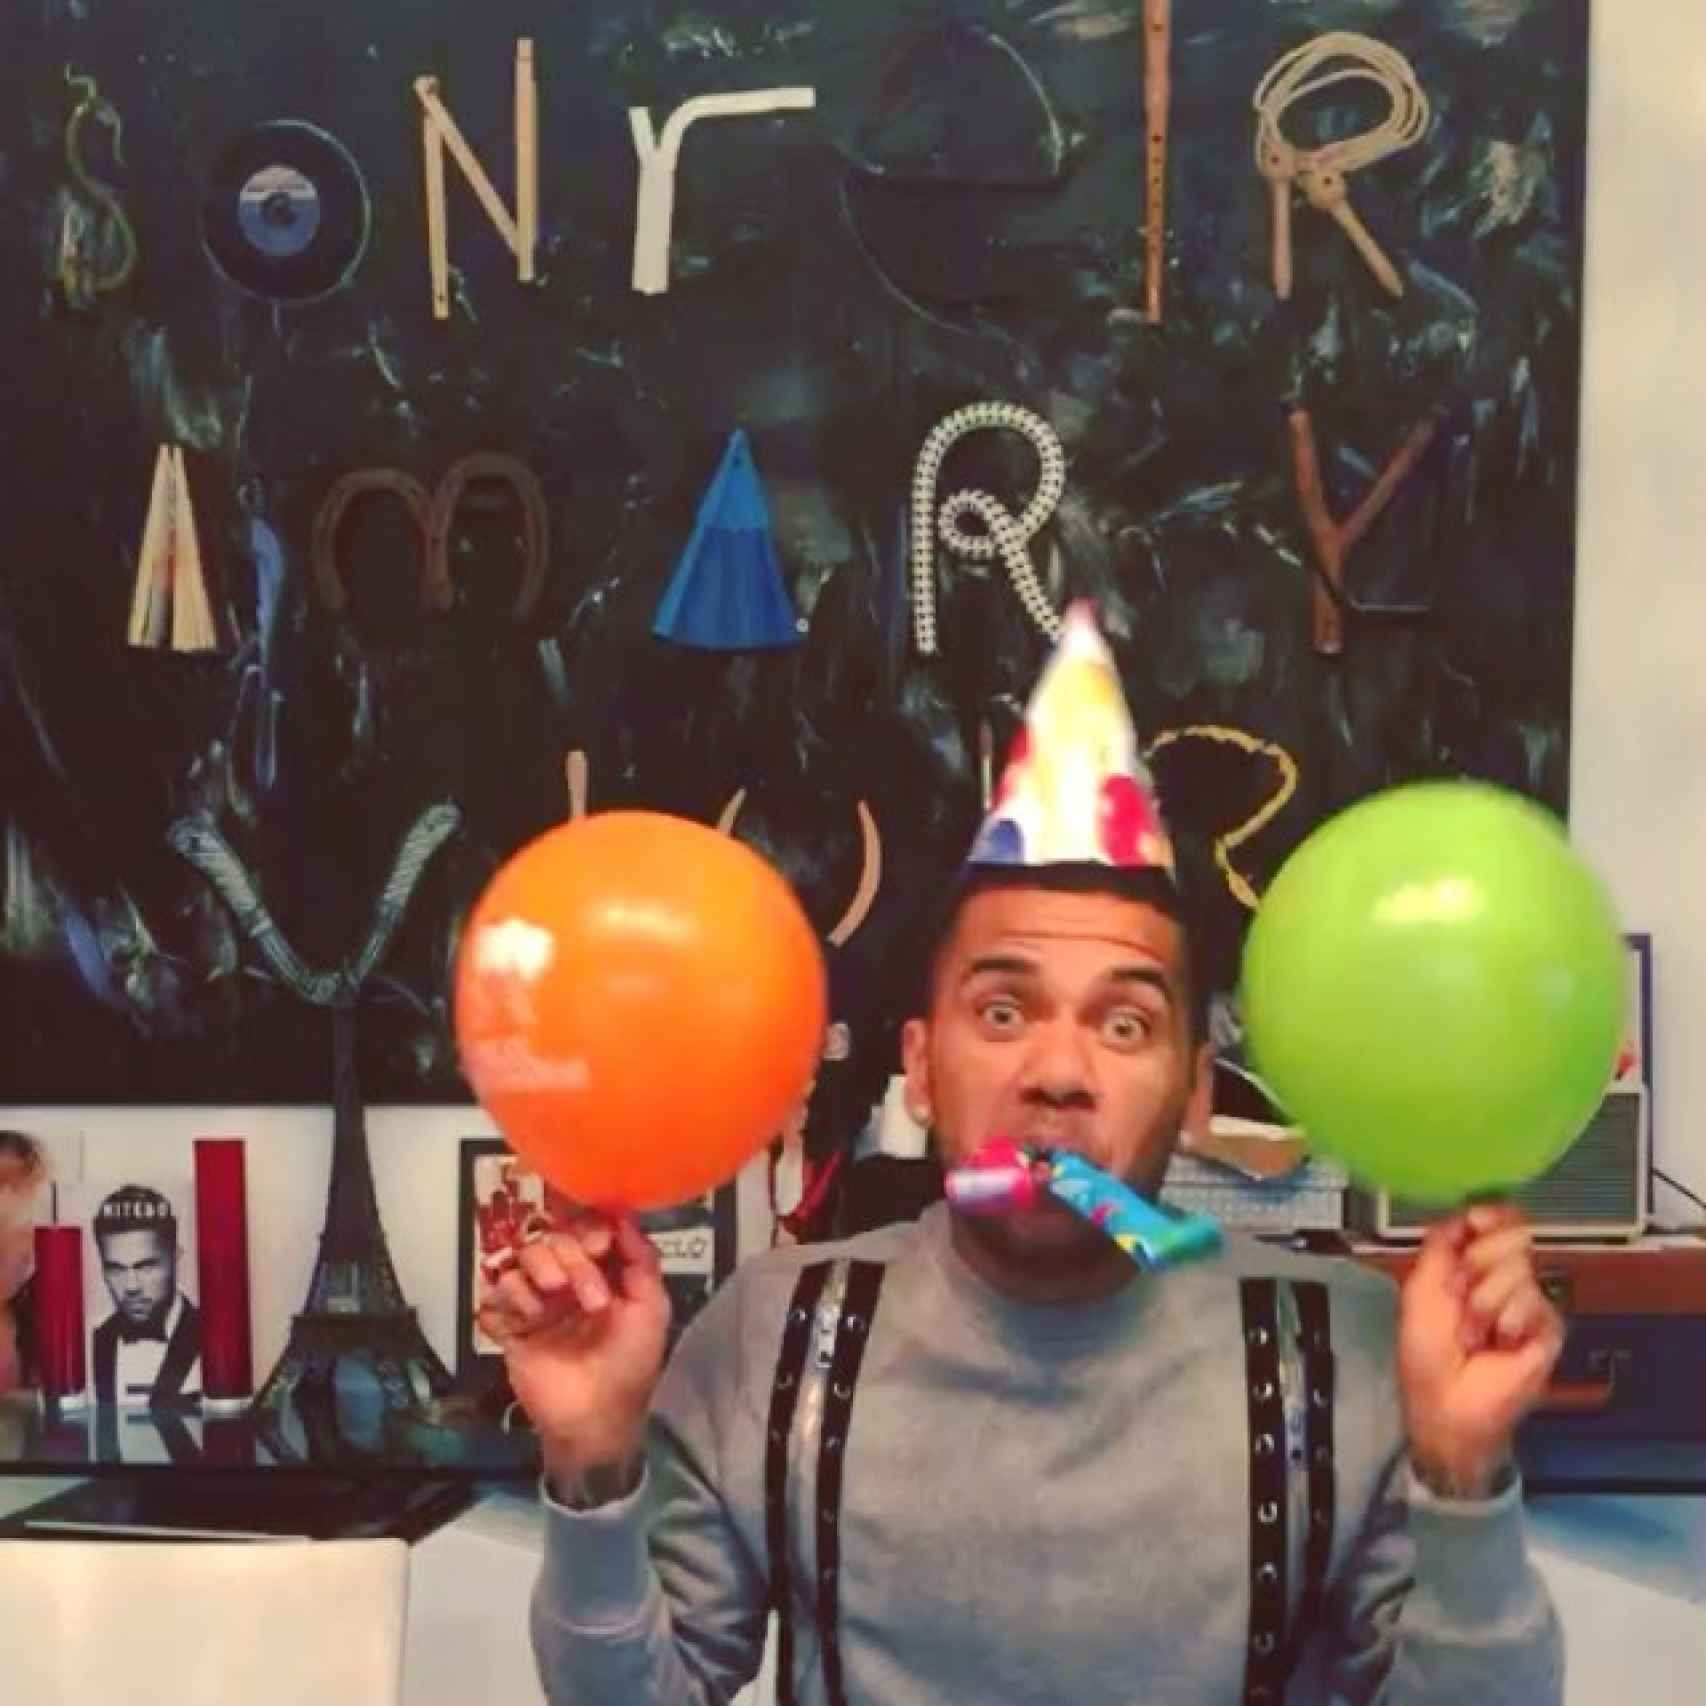 Dani Alves celebrando su cumpleñaos